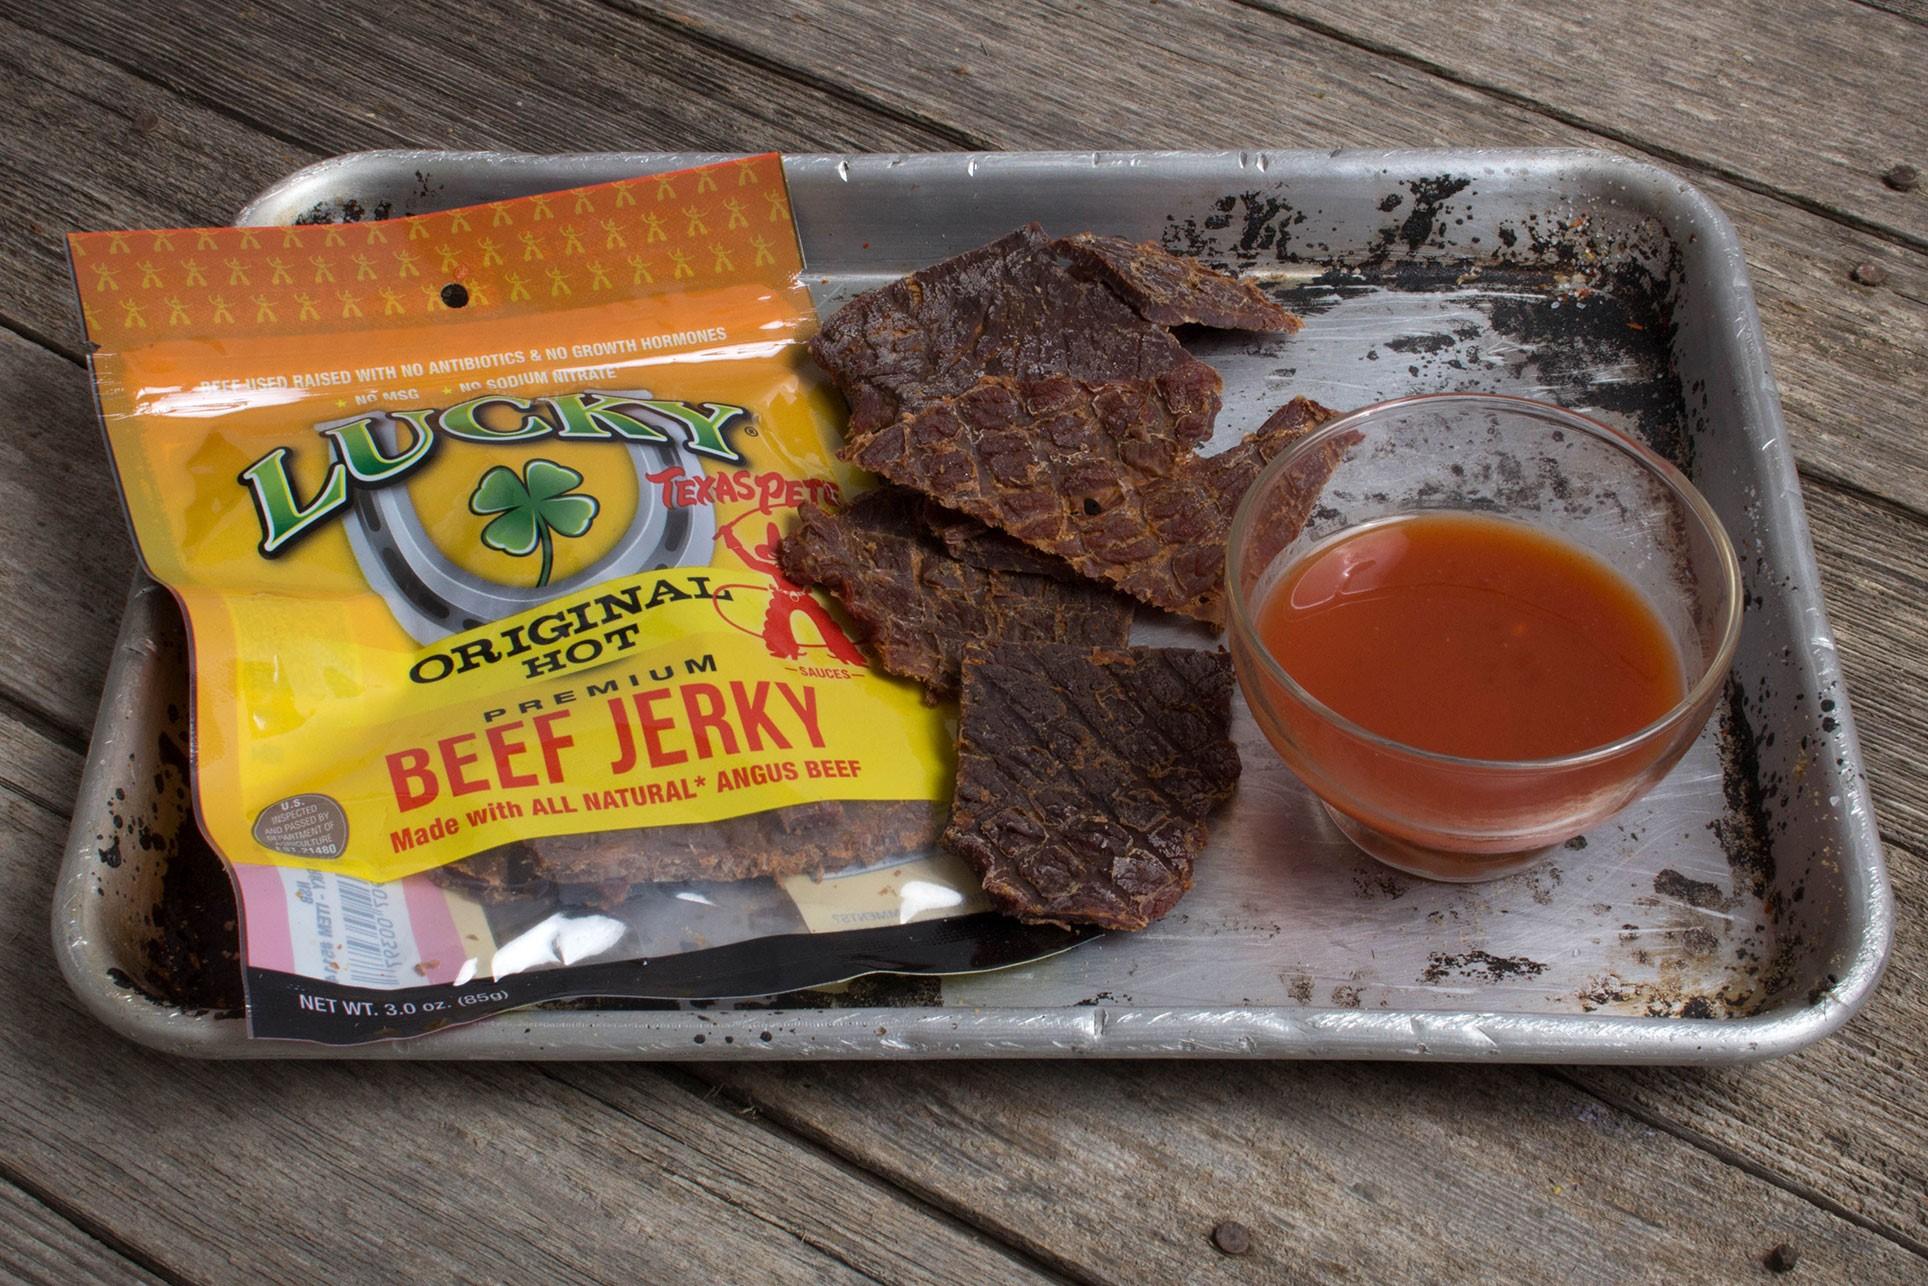 Texas Pete Spicy Jerky